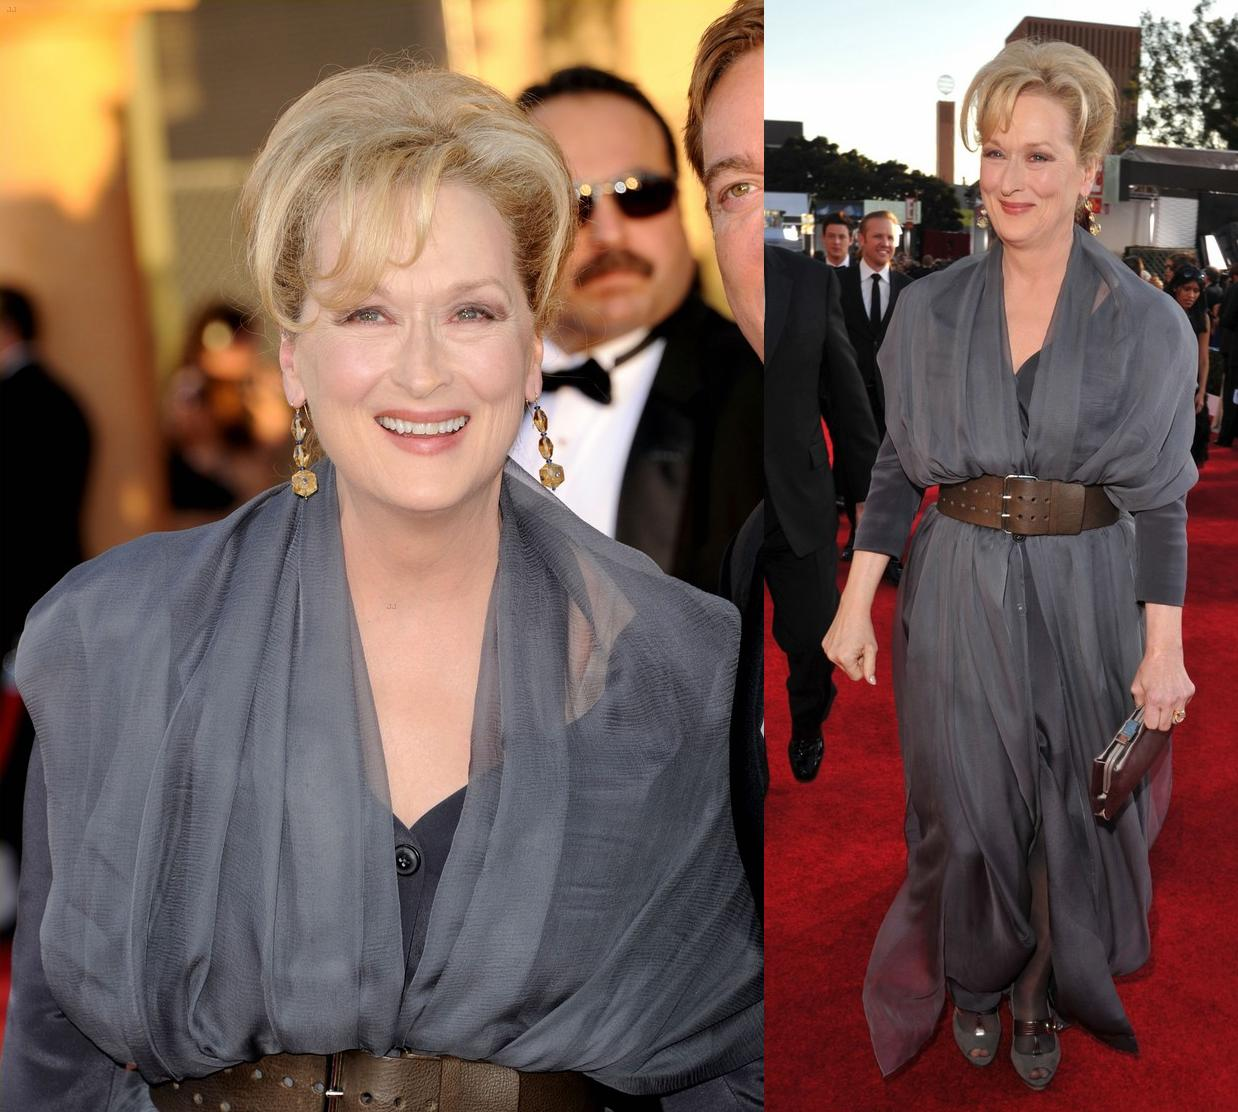 http://1.bp.blogspot.com/-eF3-hvaku5U/TyaJJW2EWxI/AAAAAAAAEmQ/jC3eADsYrcQ/s1600/Meryl+Streep+In+Vivienne+Westwood+-+2012+Screen+Actors+Guild+Awards.jpg